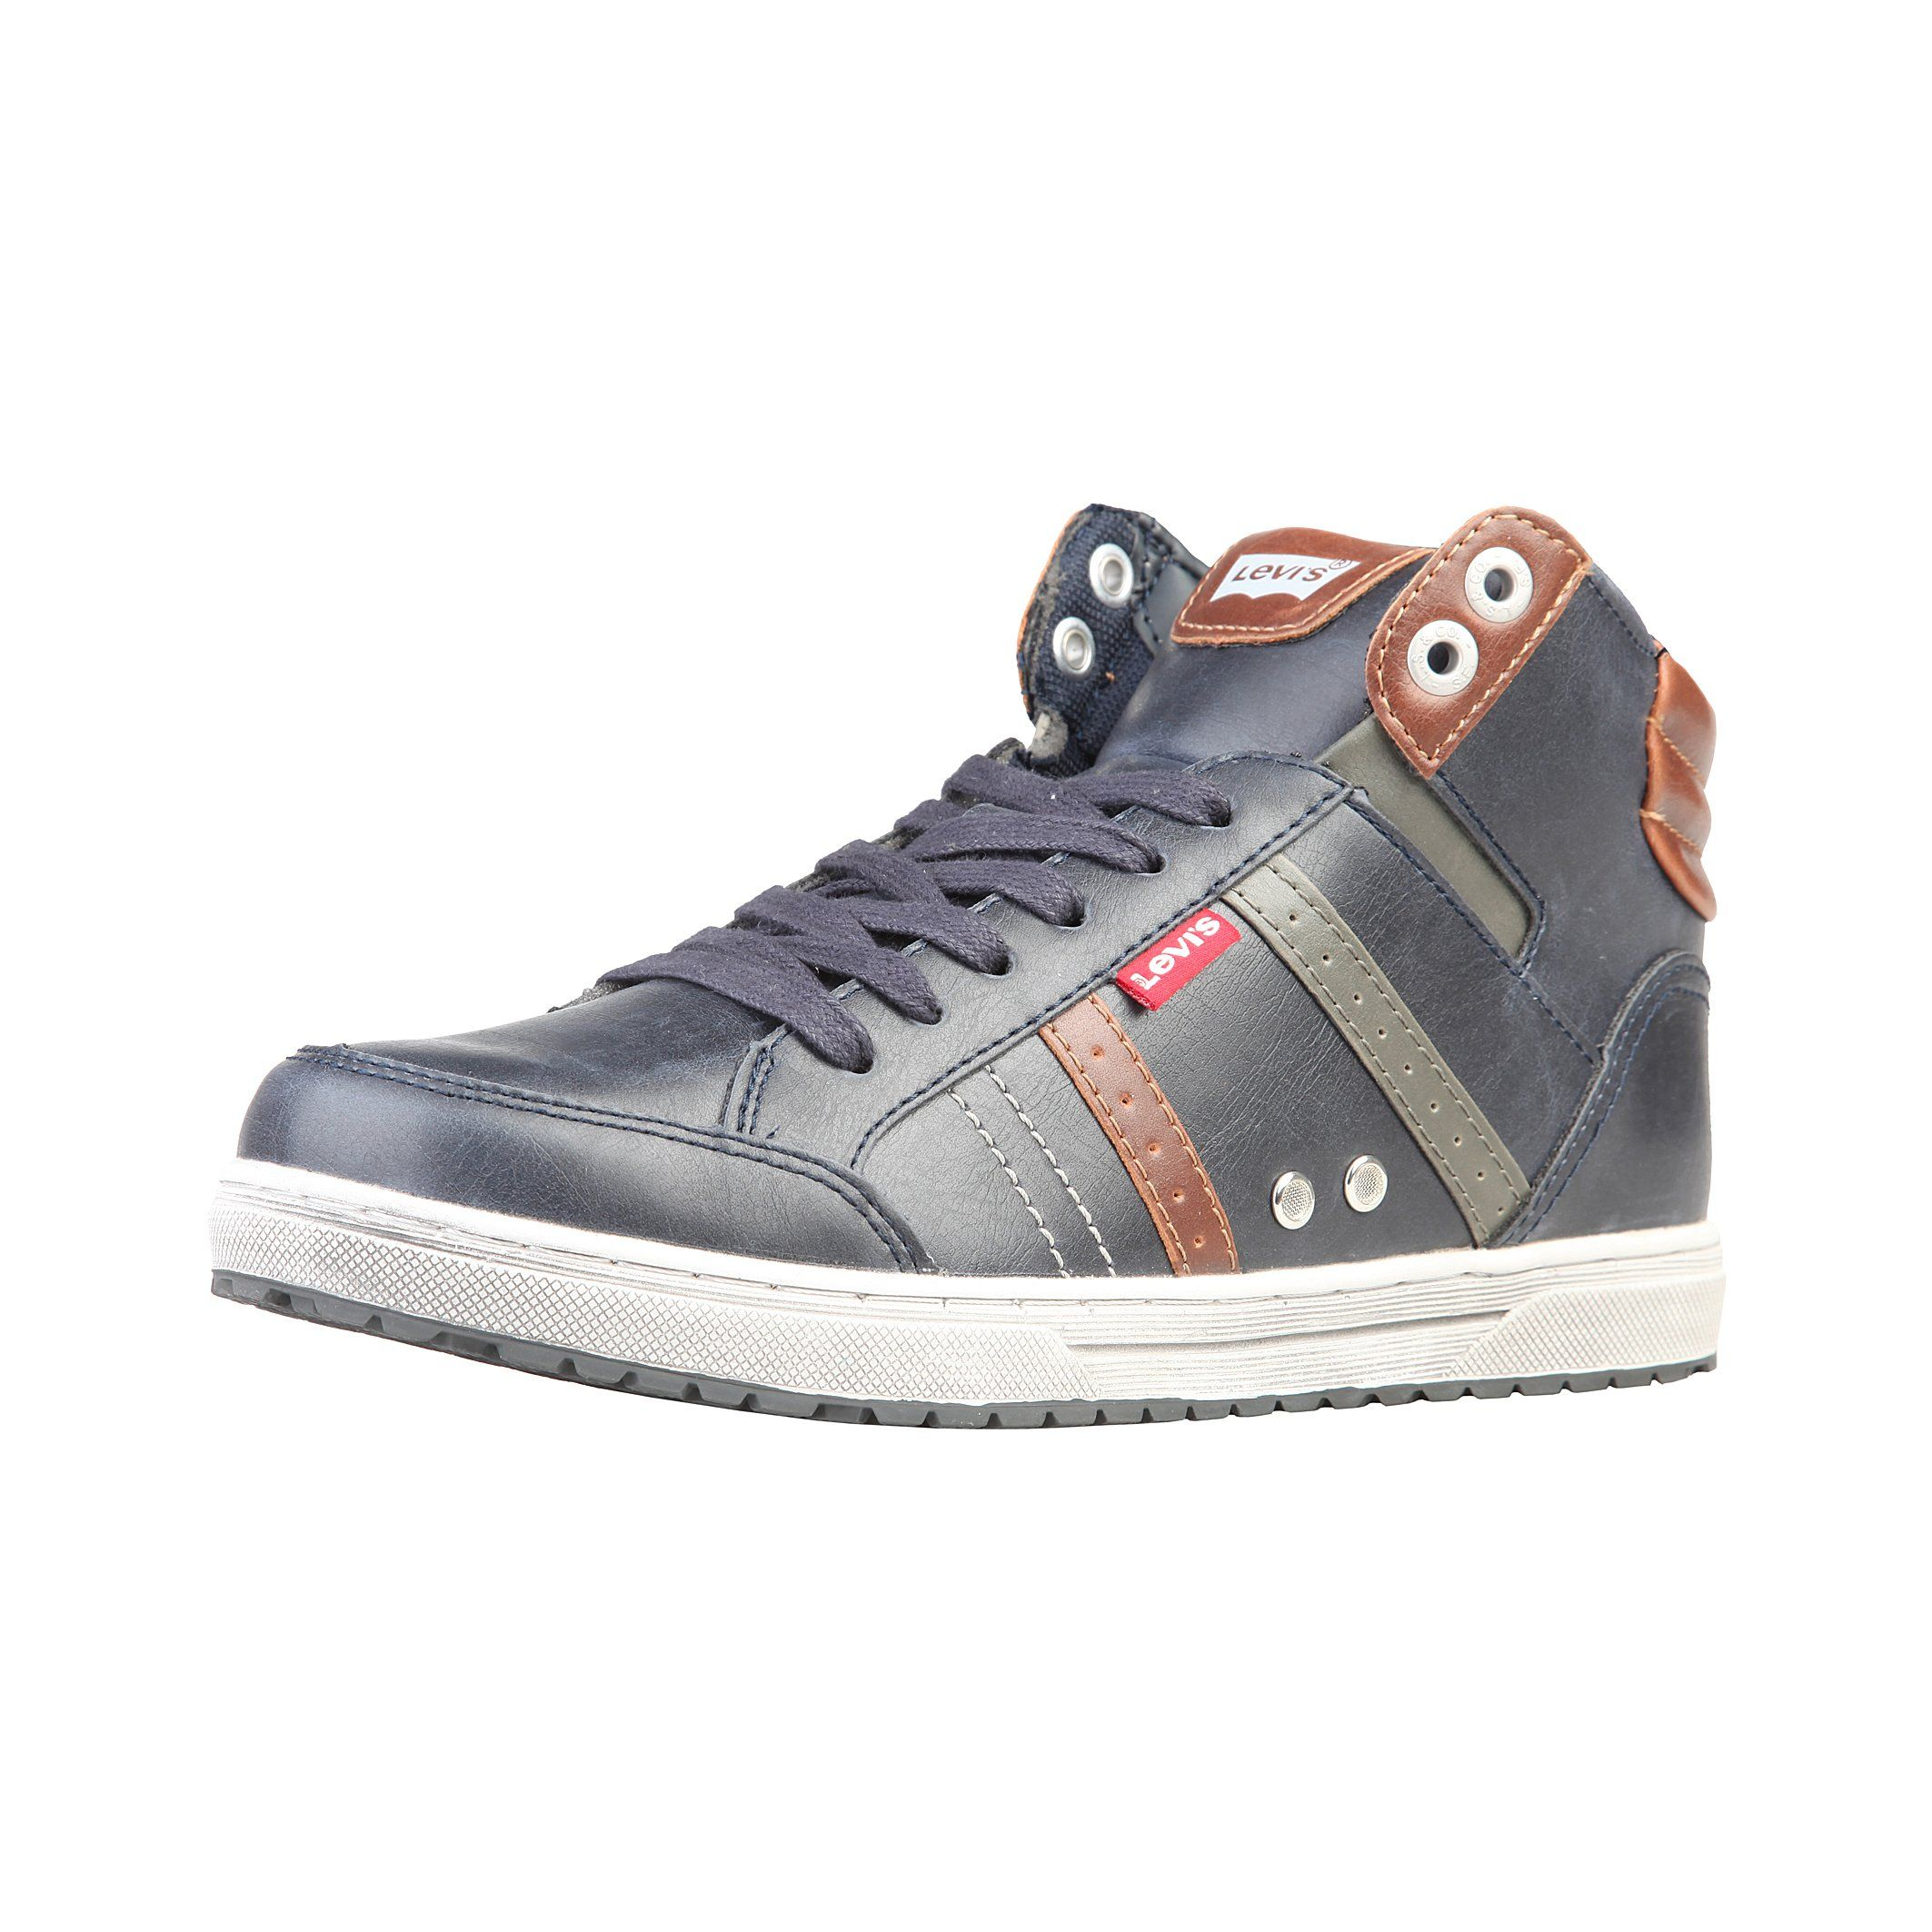 Sam Blue - Levis - Blue and Brown high top Men sneaker